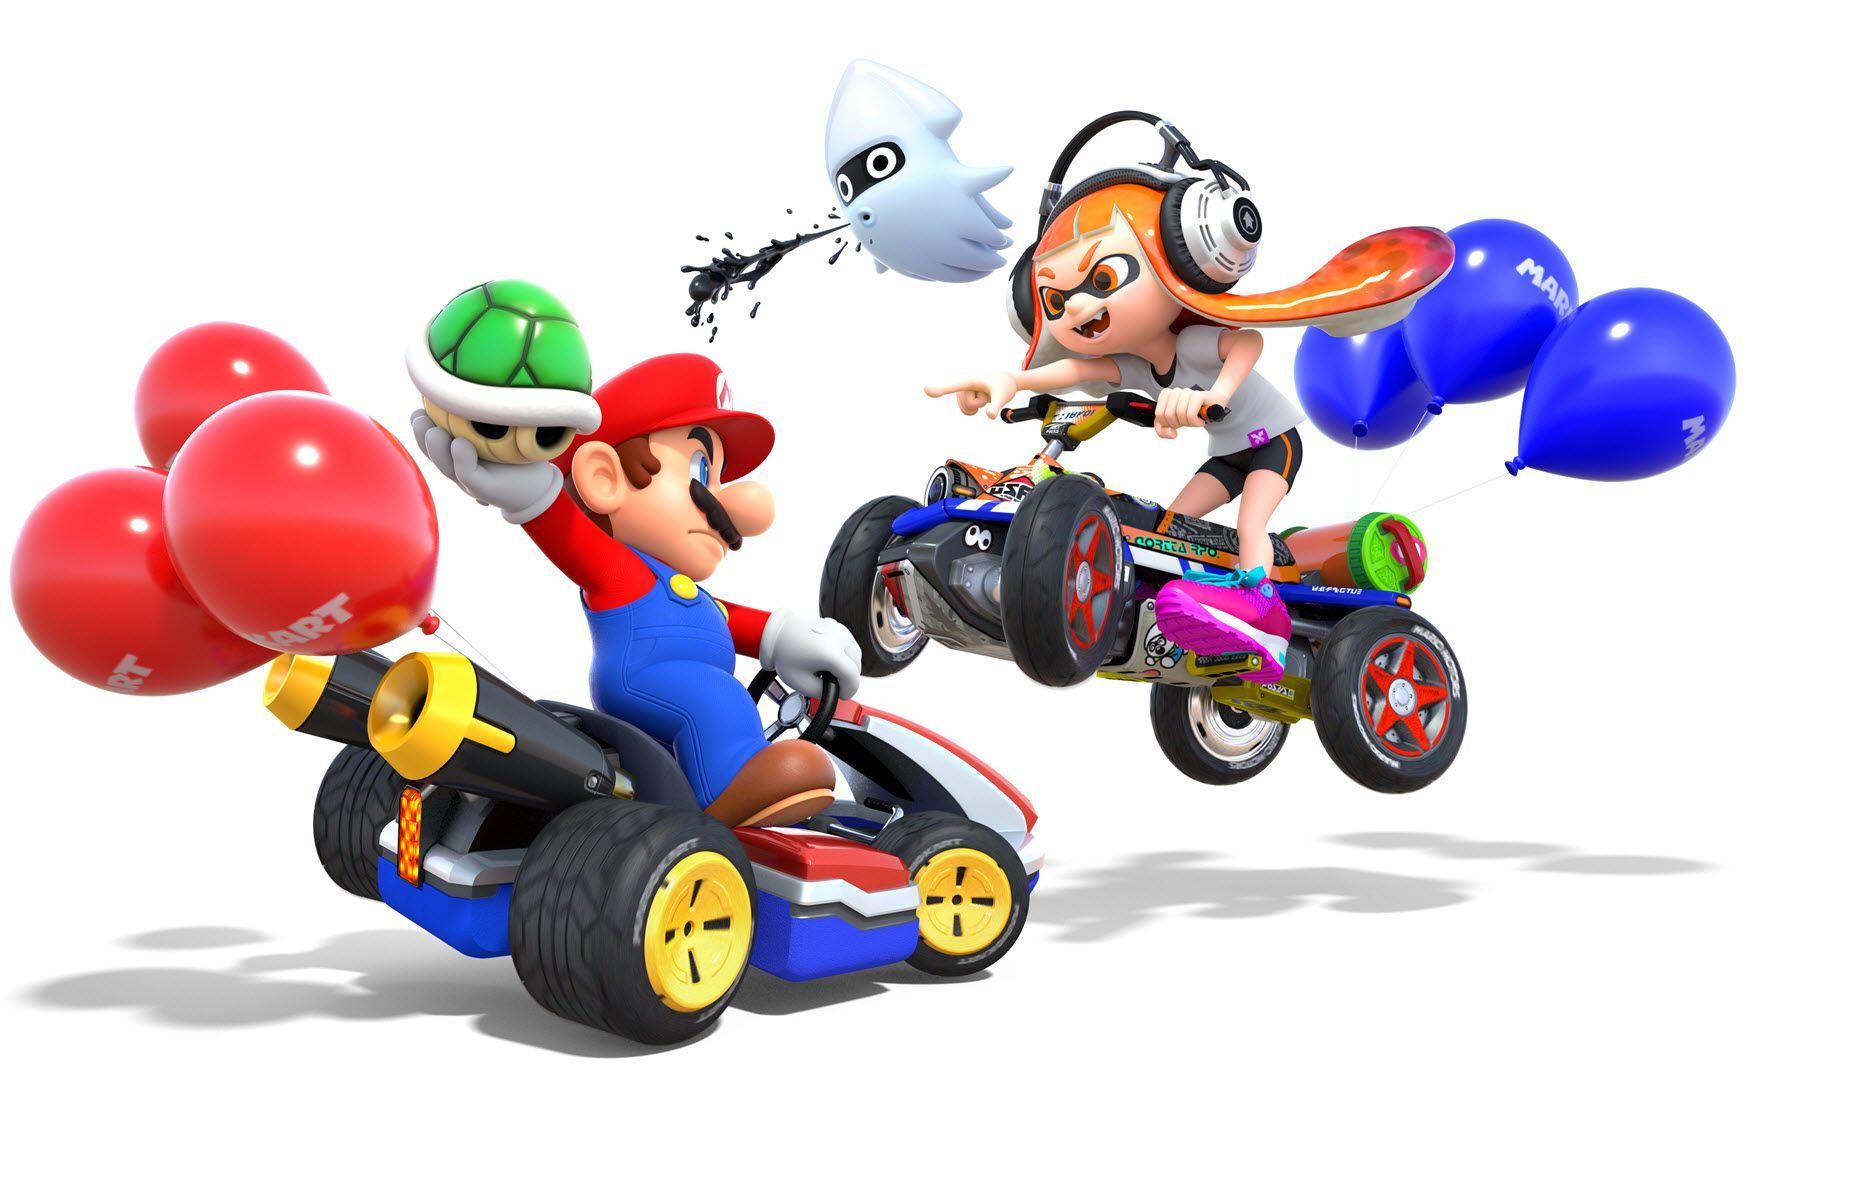 Mario Kart 8 and Splatoon 2 [Switch] £26.11 each @ Nintendo South African eShop